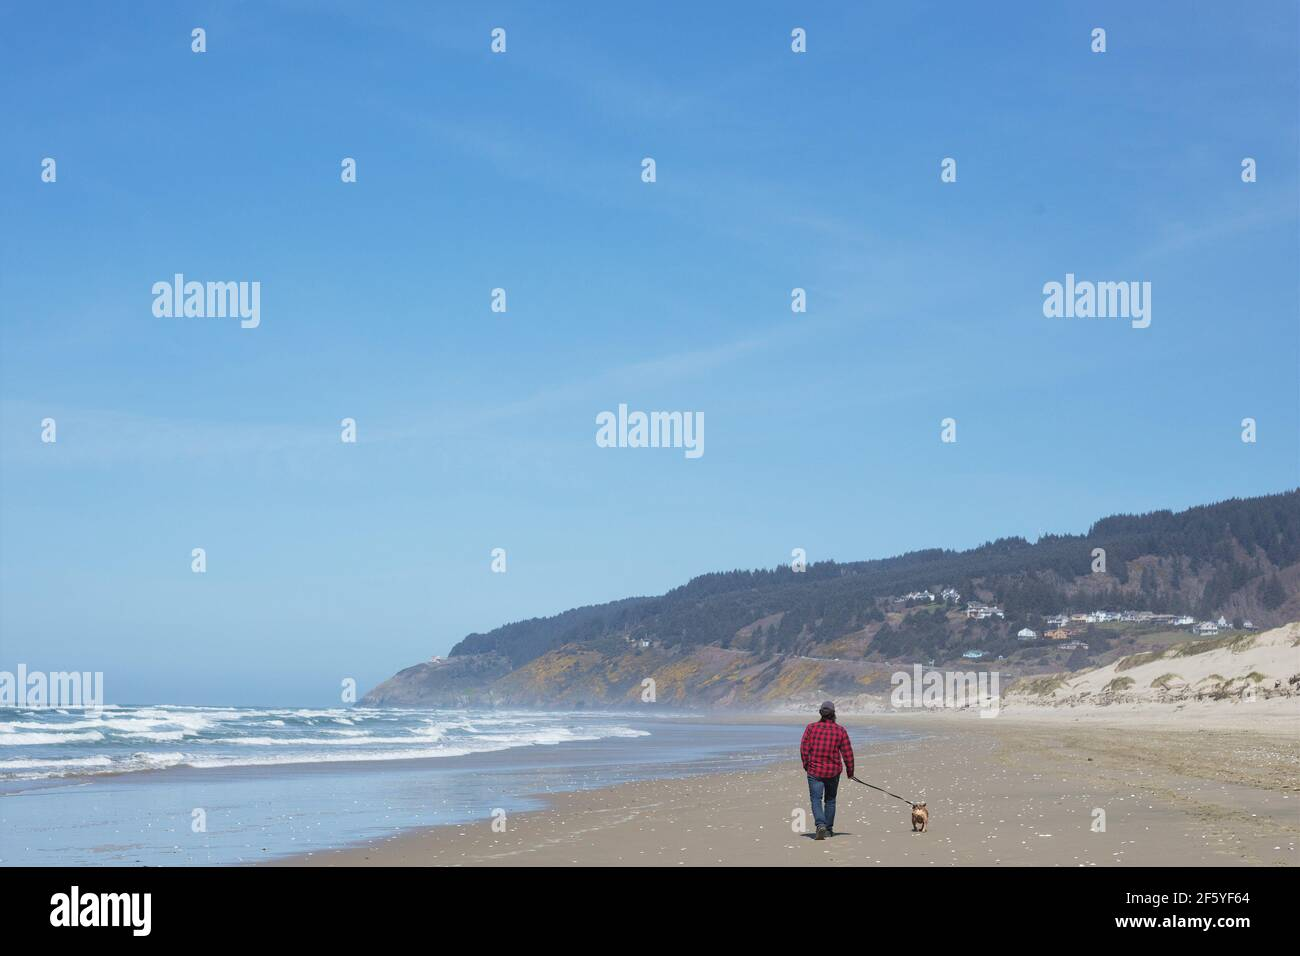 Un hombre caminando a un perro en Baker Beach en Florencia, Oregon, Estados Unidos. Foto de stock